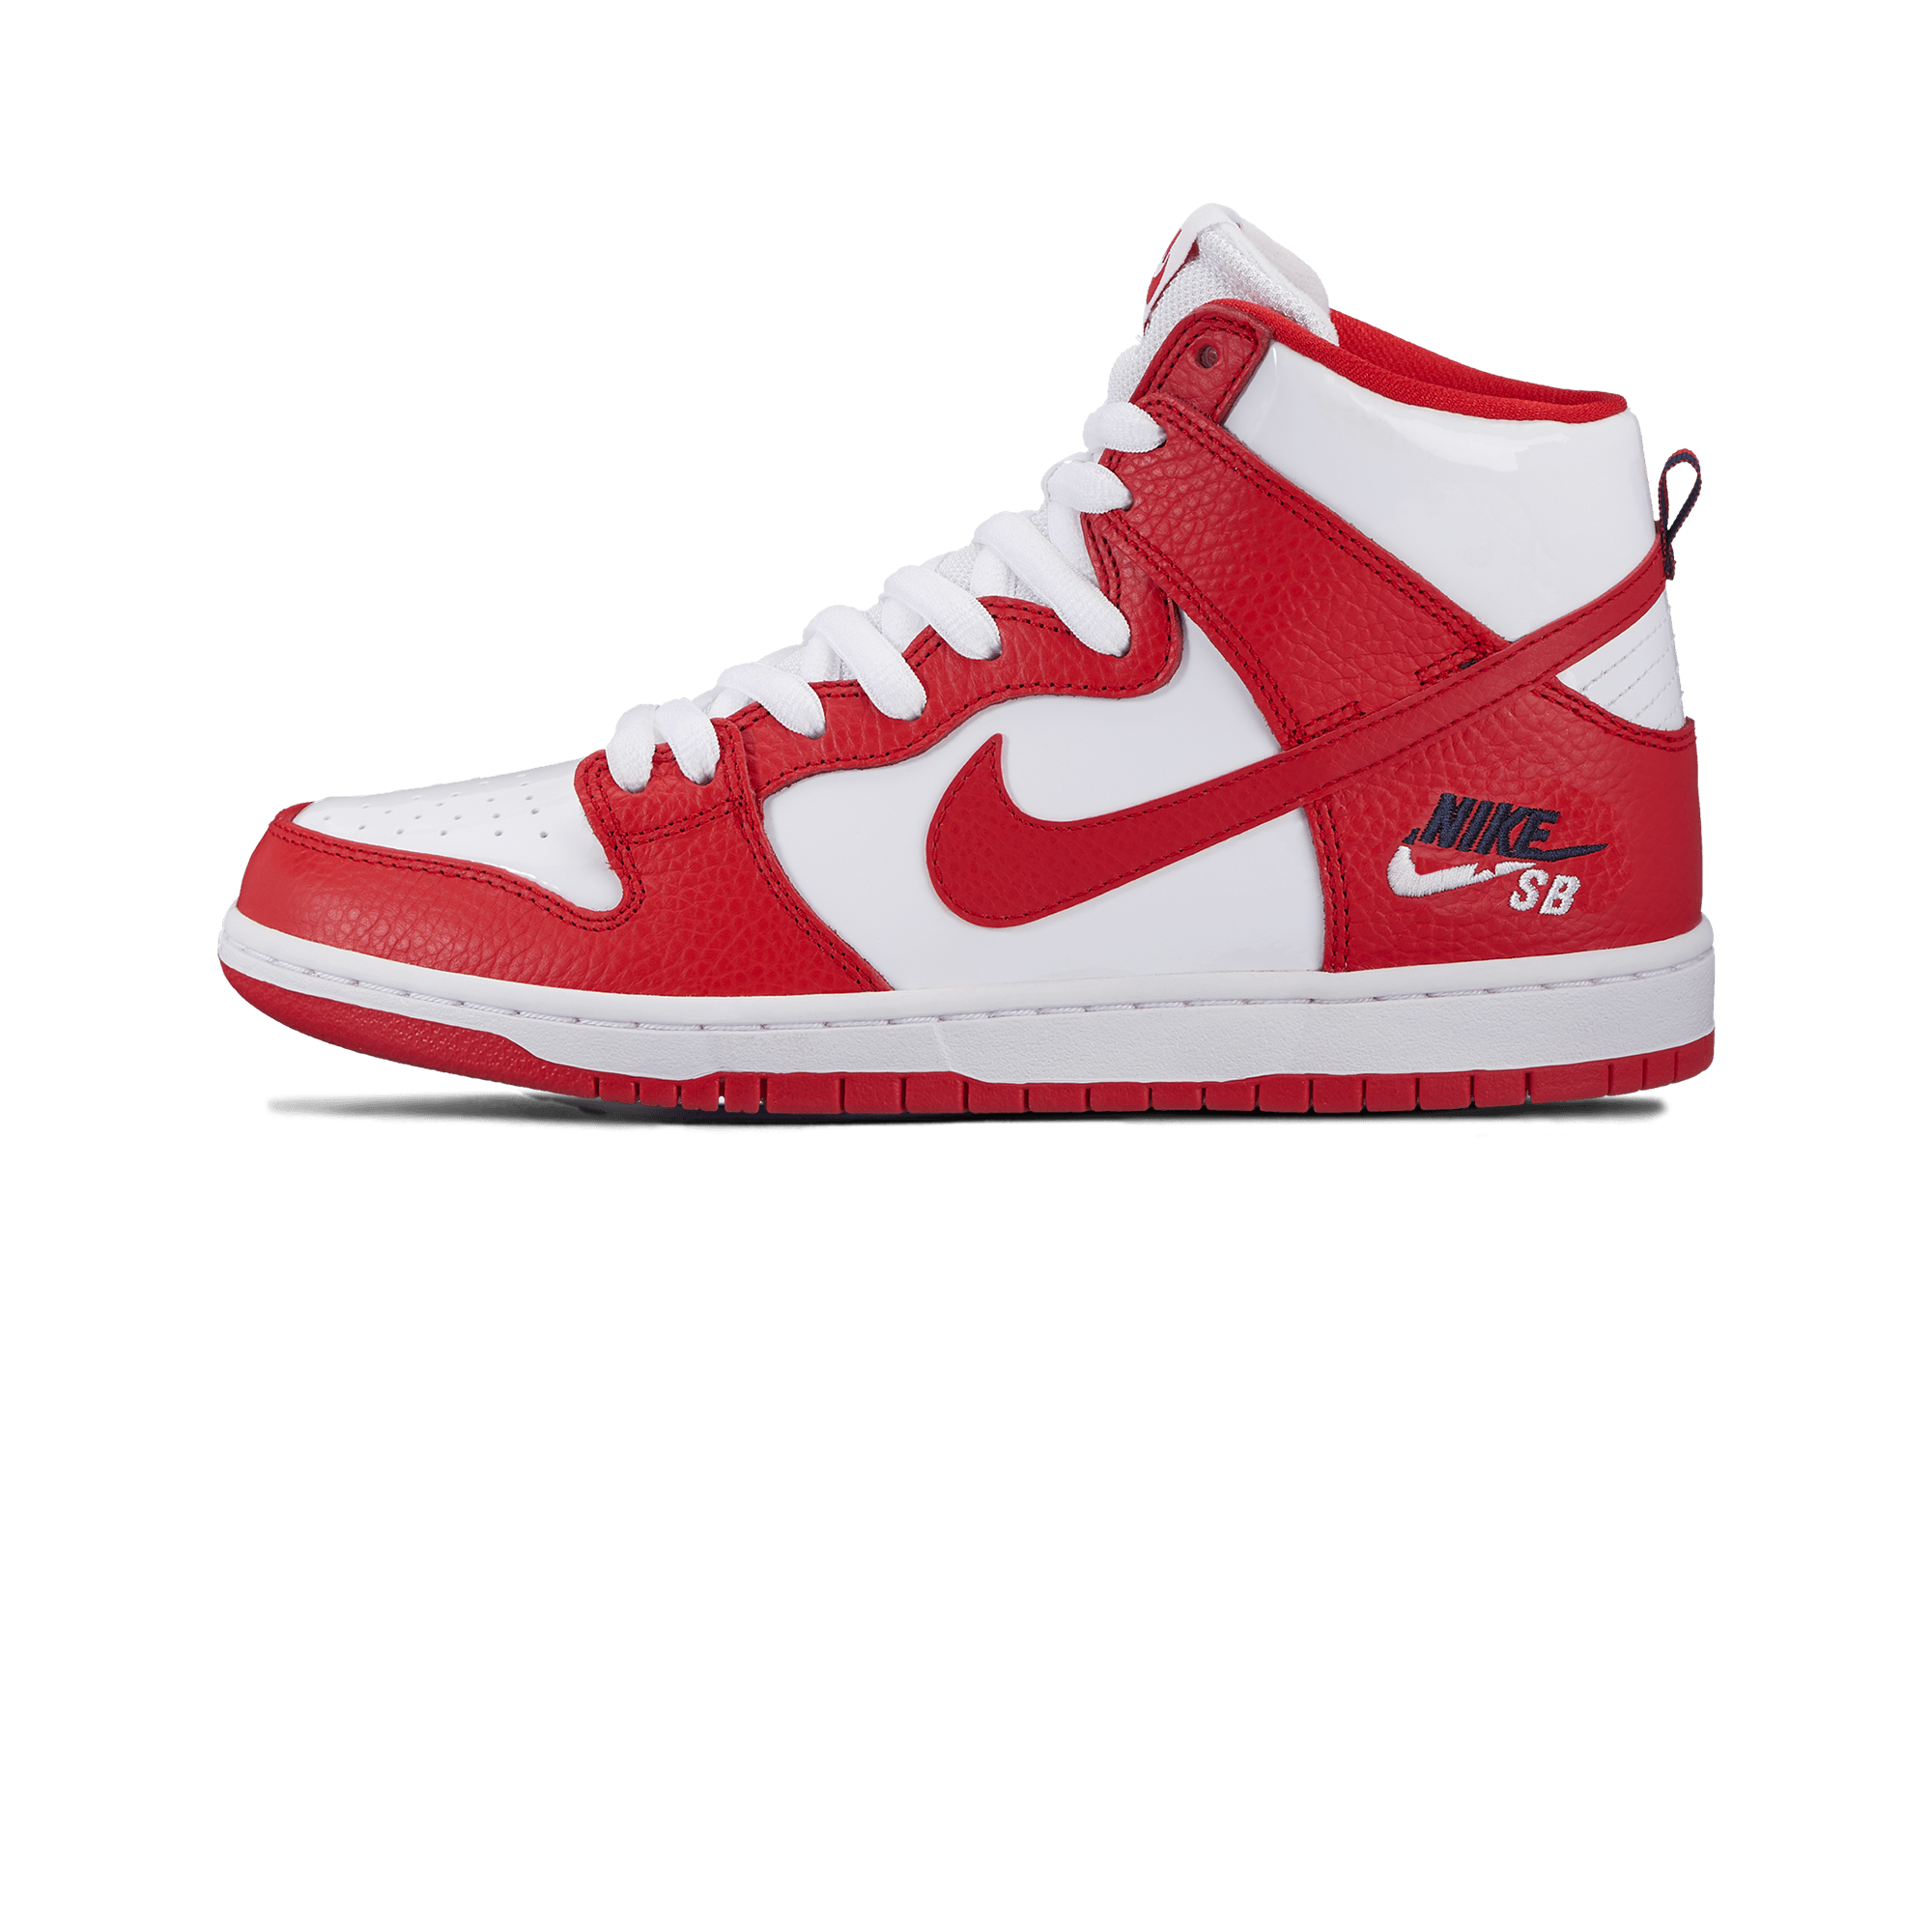 super popular ce6ec b0b23 Nike Sb Zoom Dunk High Pro university red/white - Men | Holypopstore.com